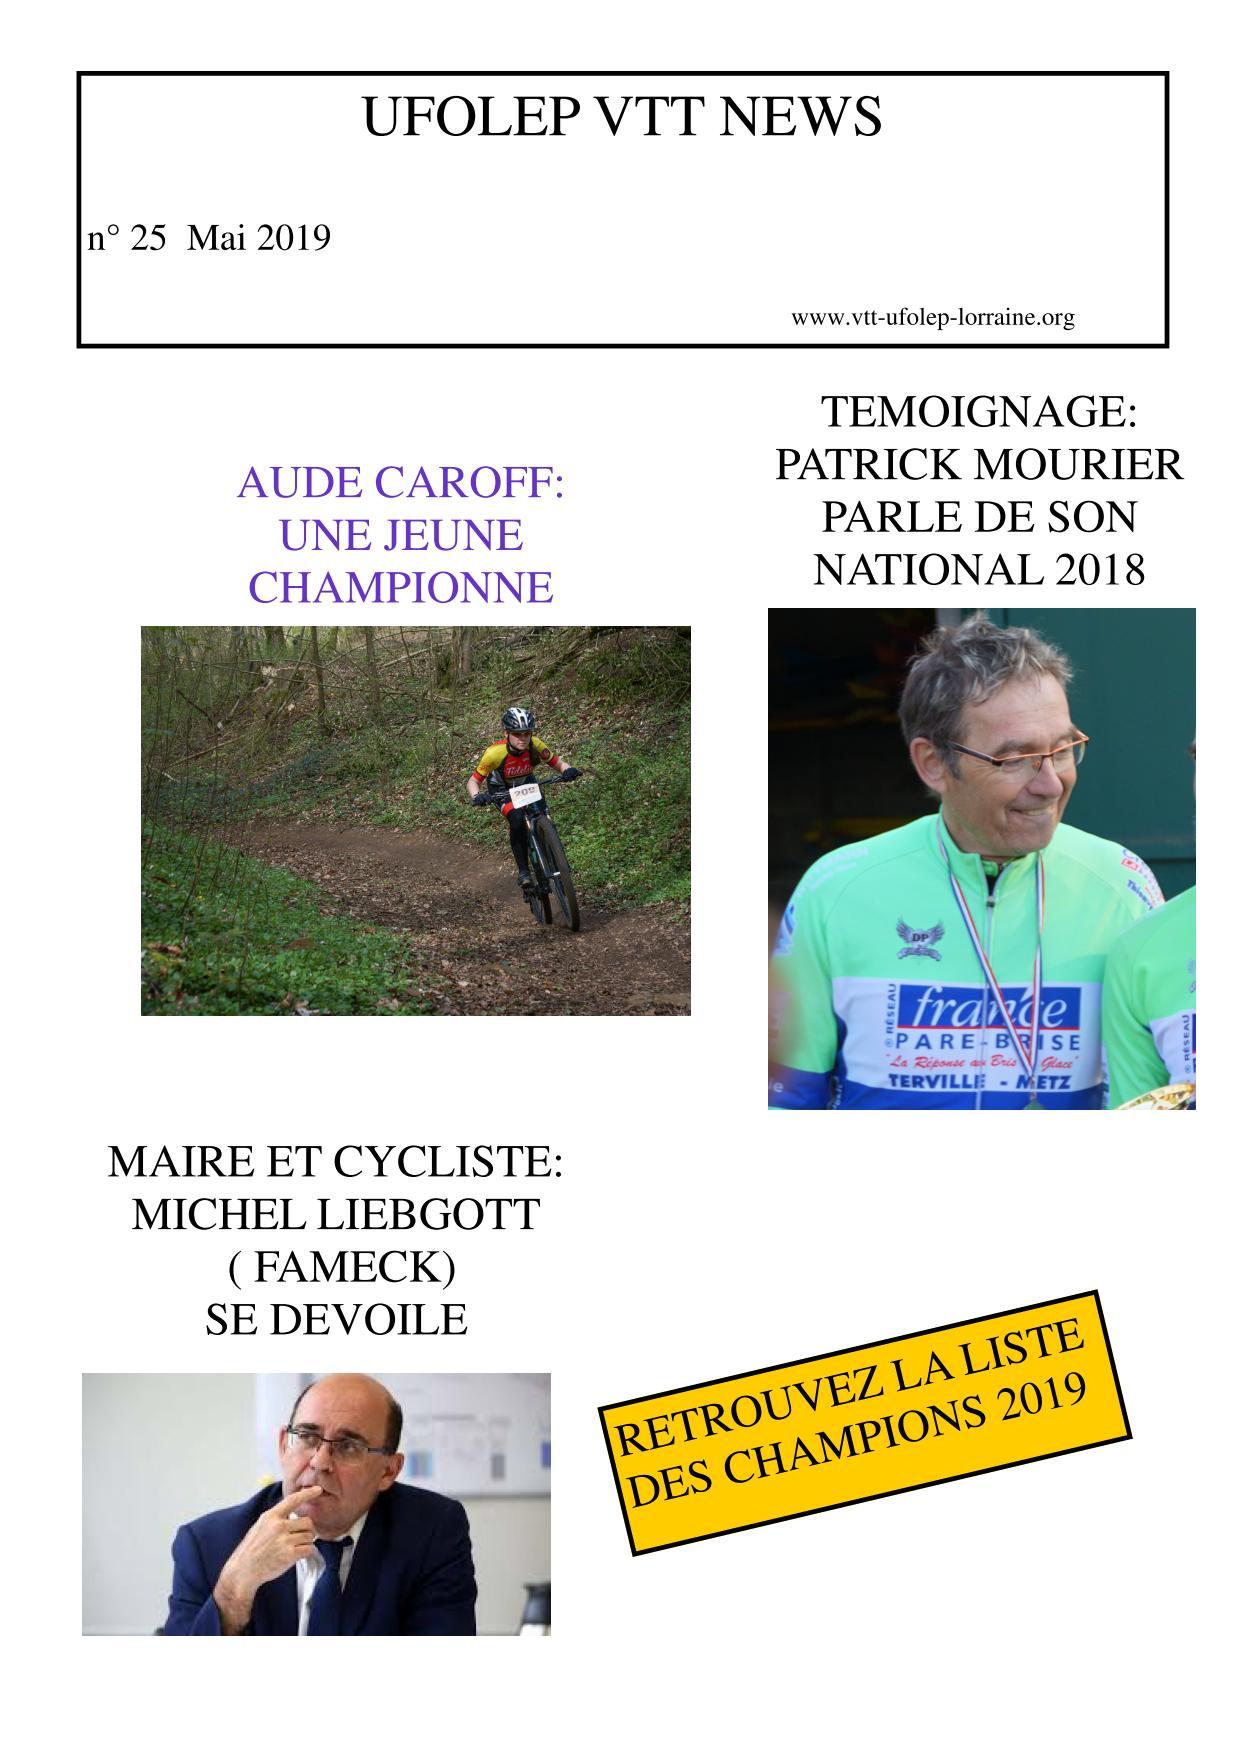 Calendrier Ufolep 2019 Cyclisme.Challenge De Lorraine Vtt Ufolep